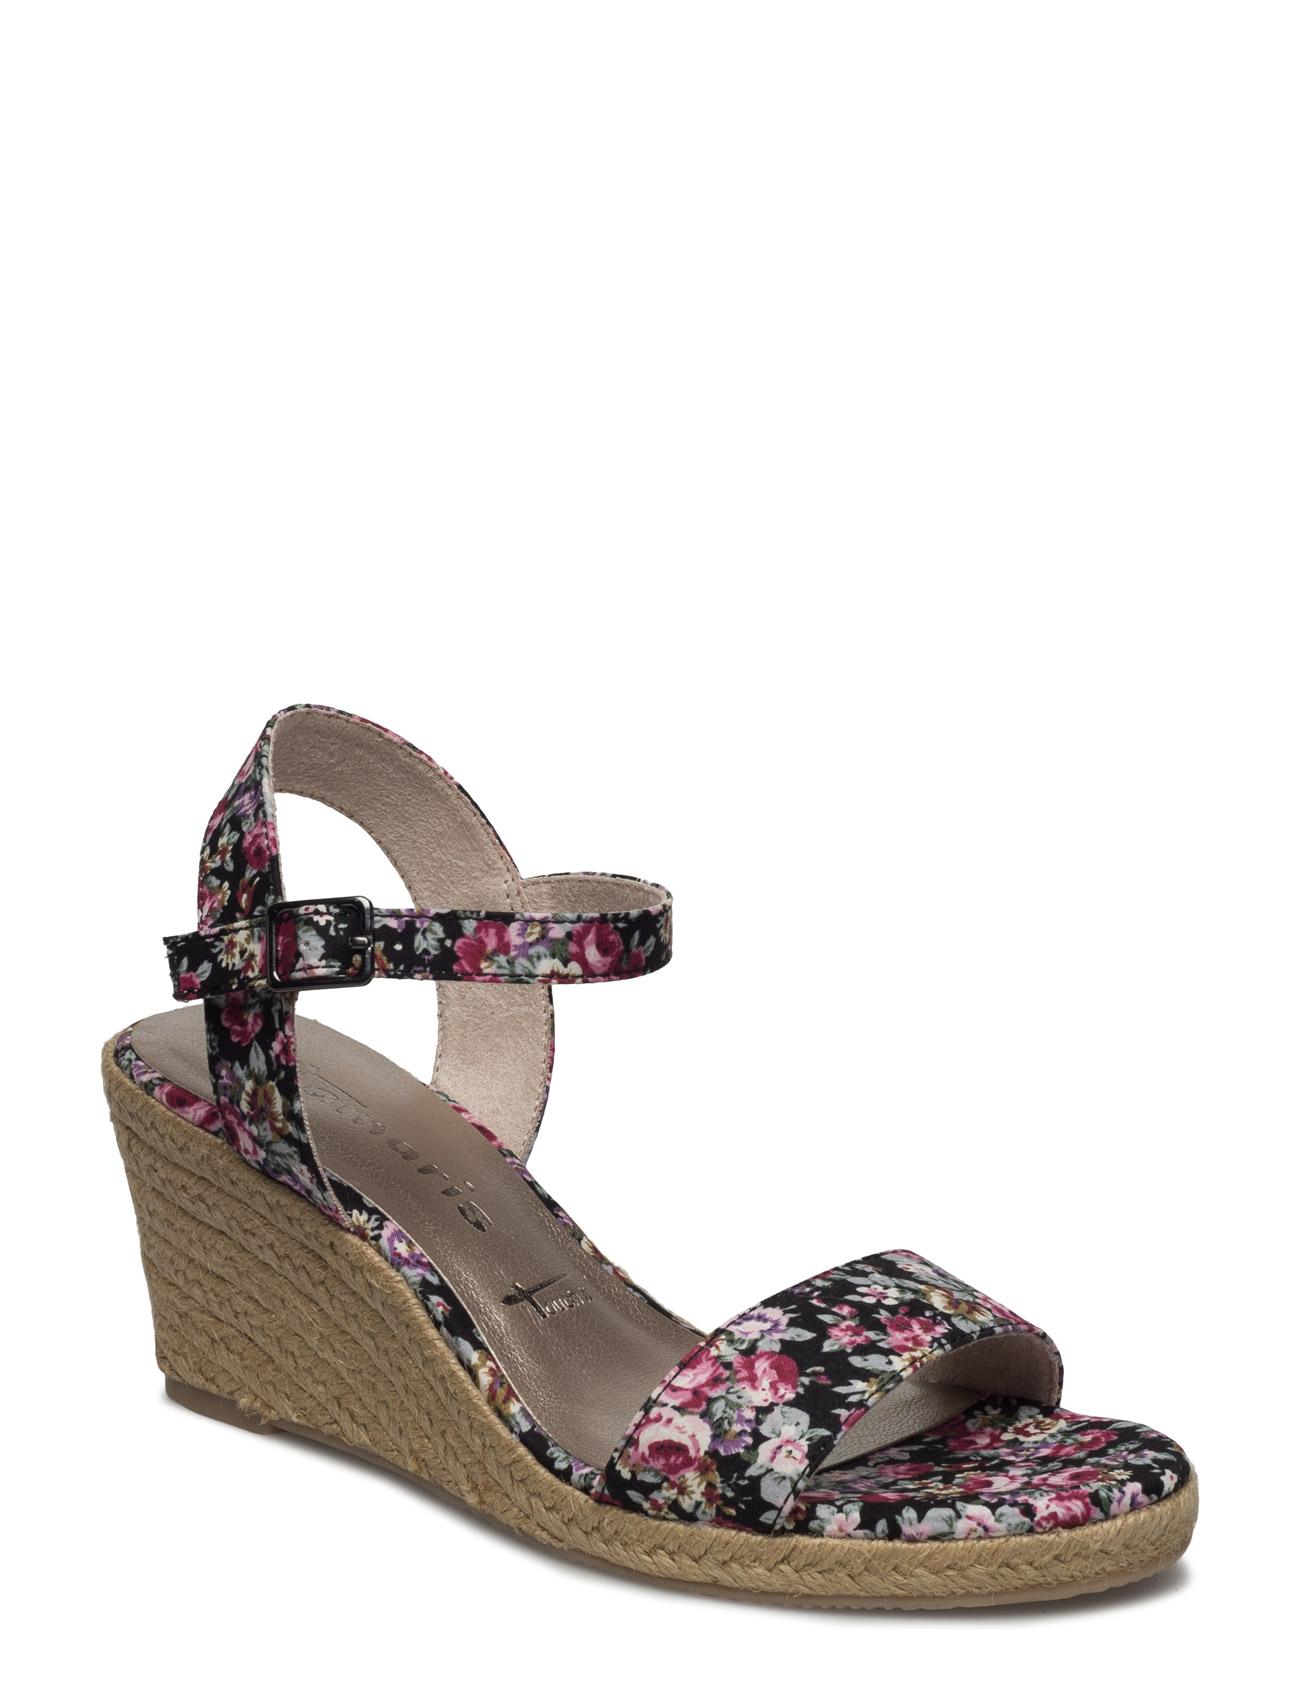 Woms sandals - livia fra tamaris fra boozt.com dk